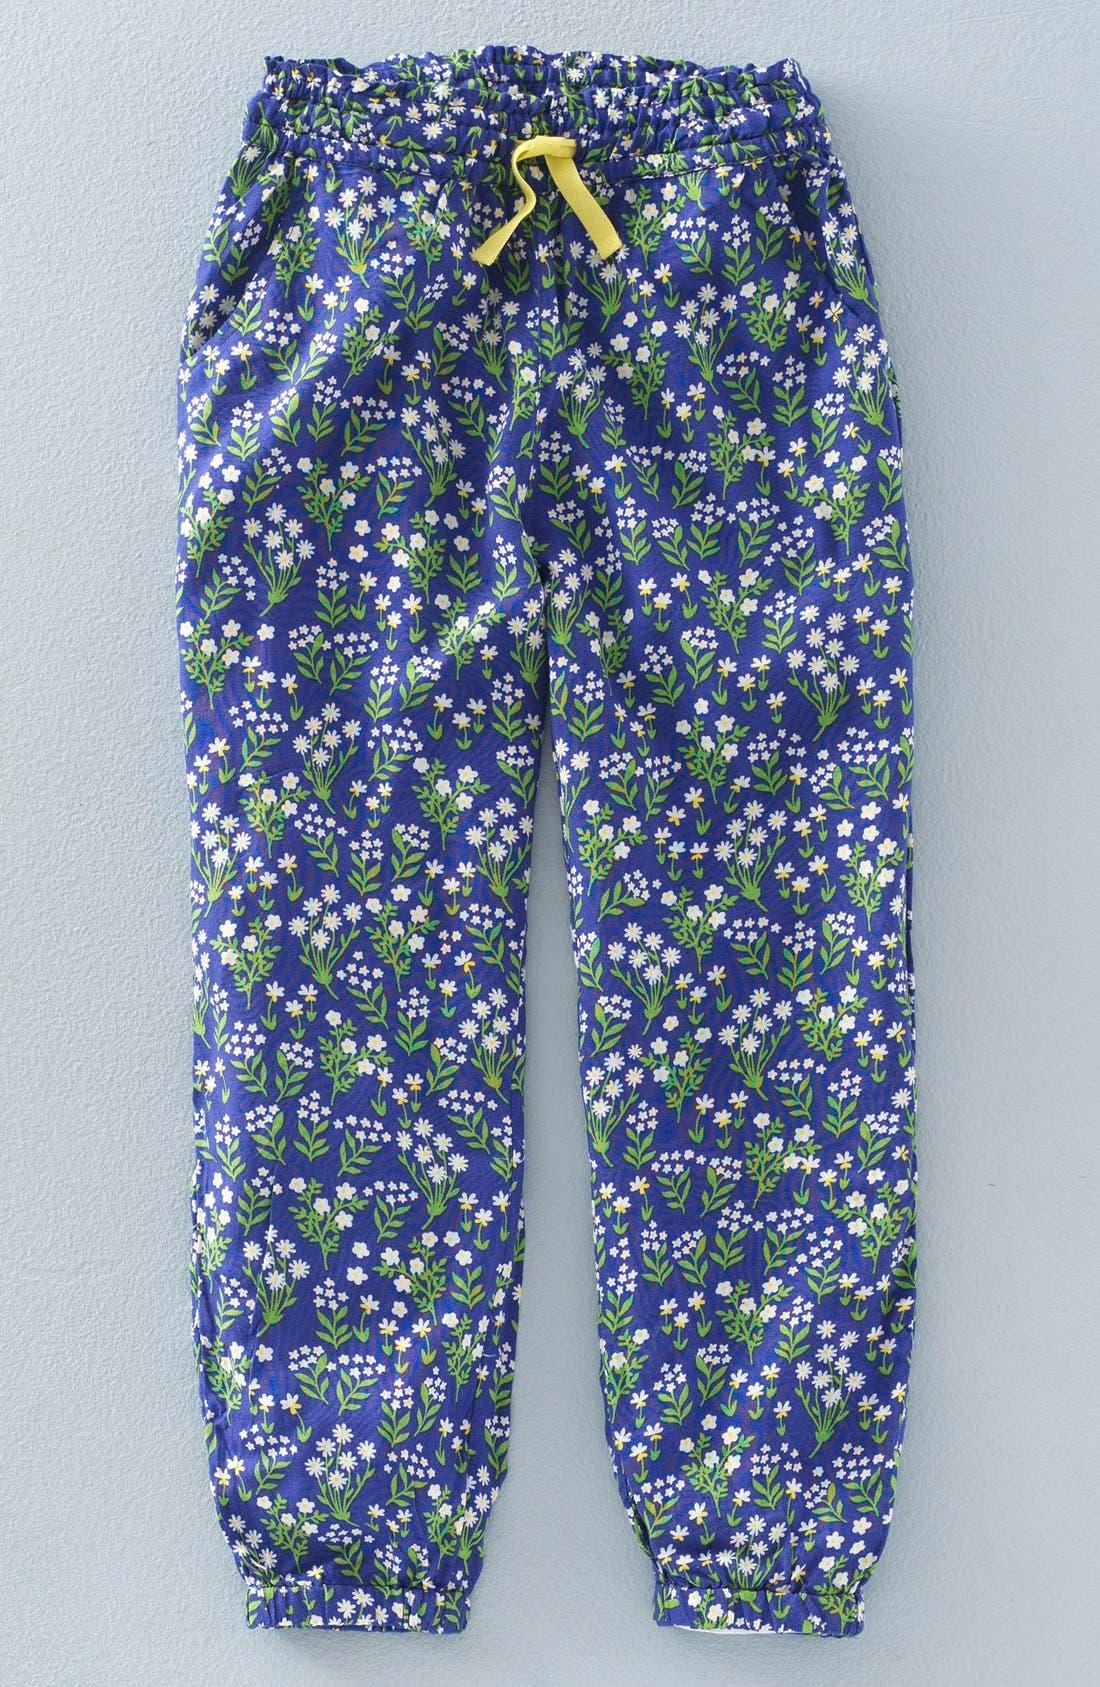 'Pretty' Floral Print Pants,                             Main thumbnail 1, color,                             404